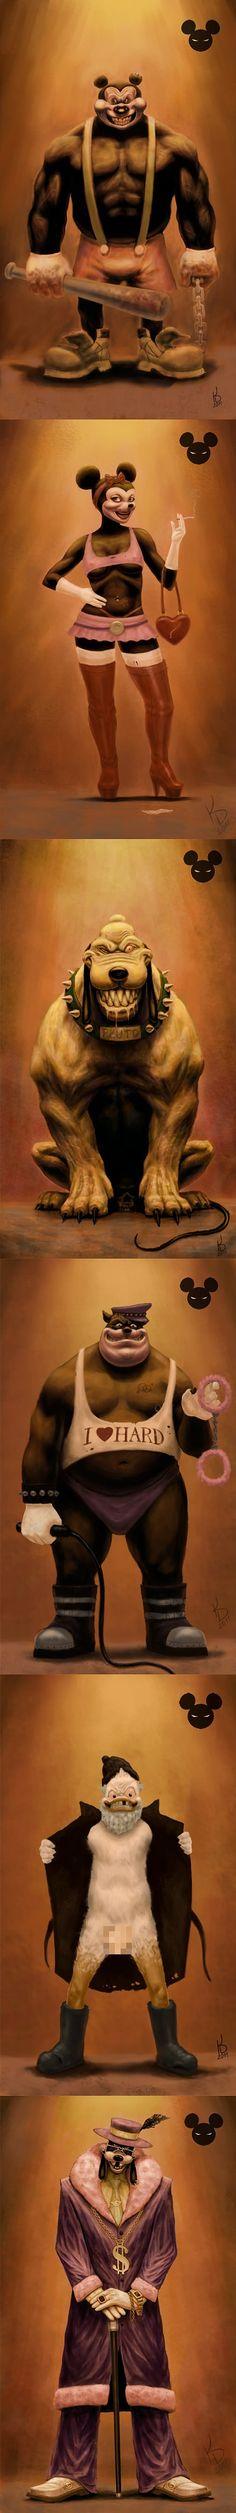 Disney awesome